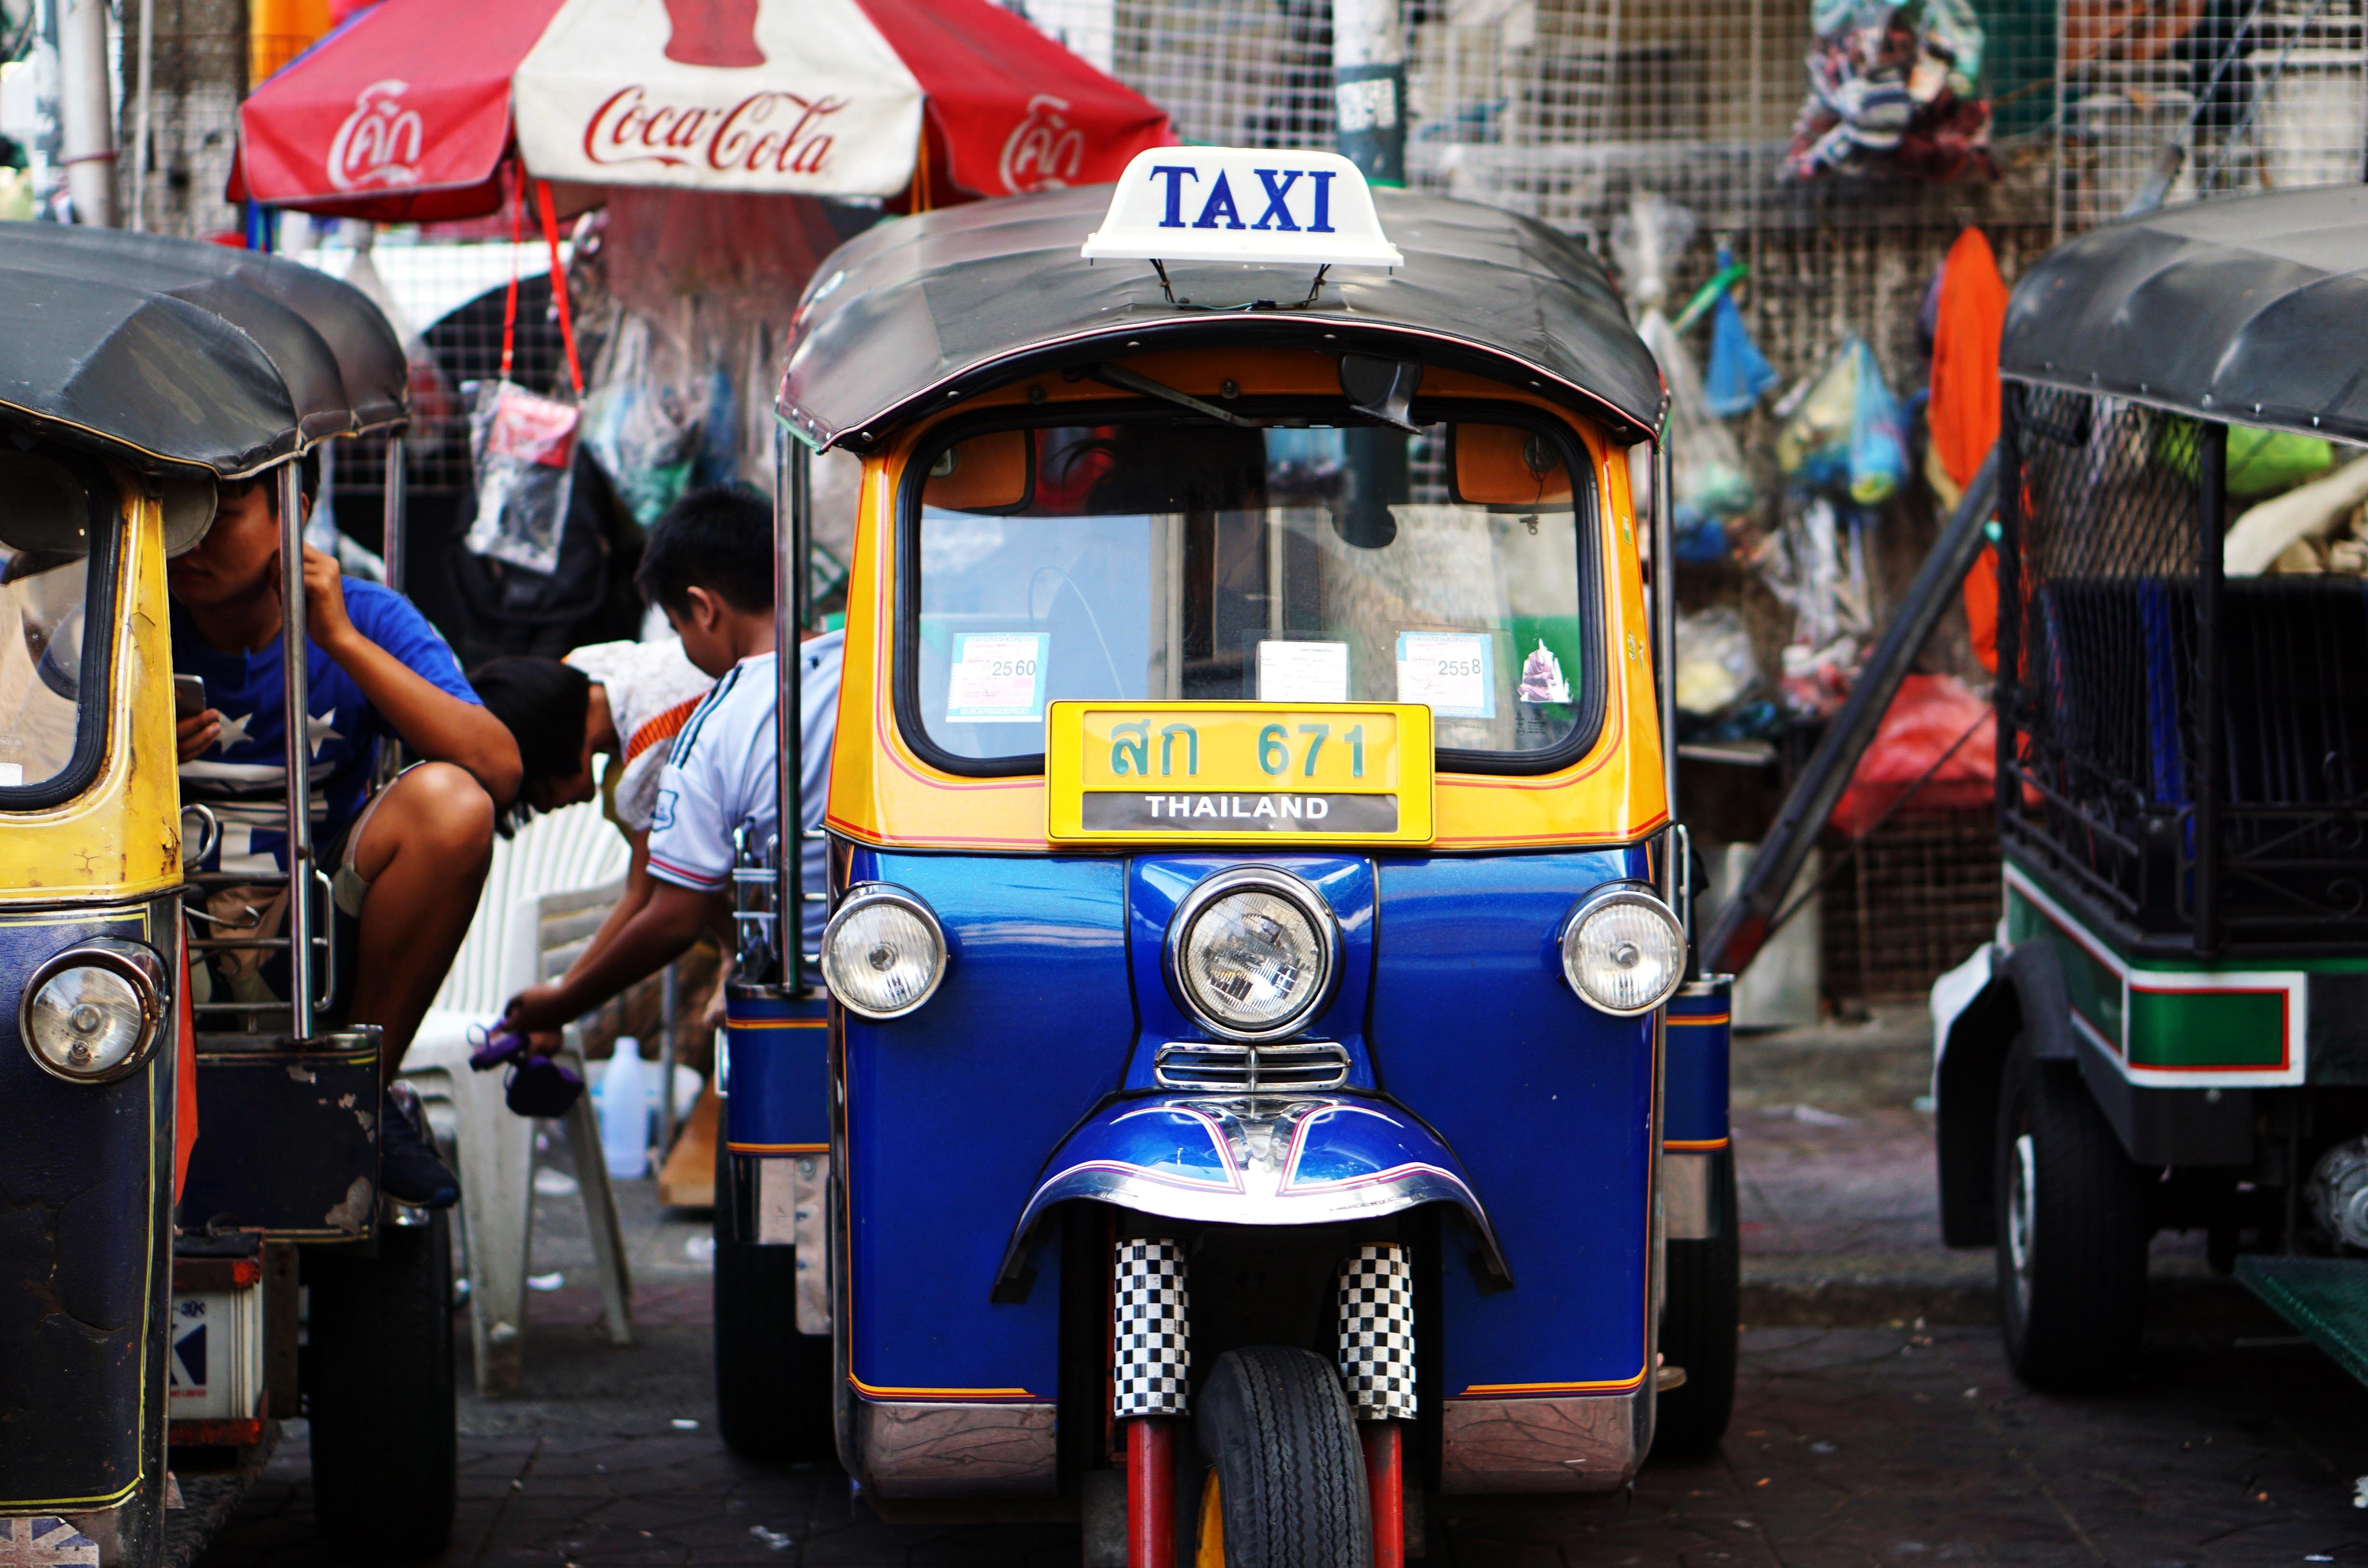 An auto rickshaw taxi in a side street in Bangkok